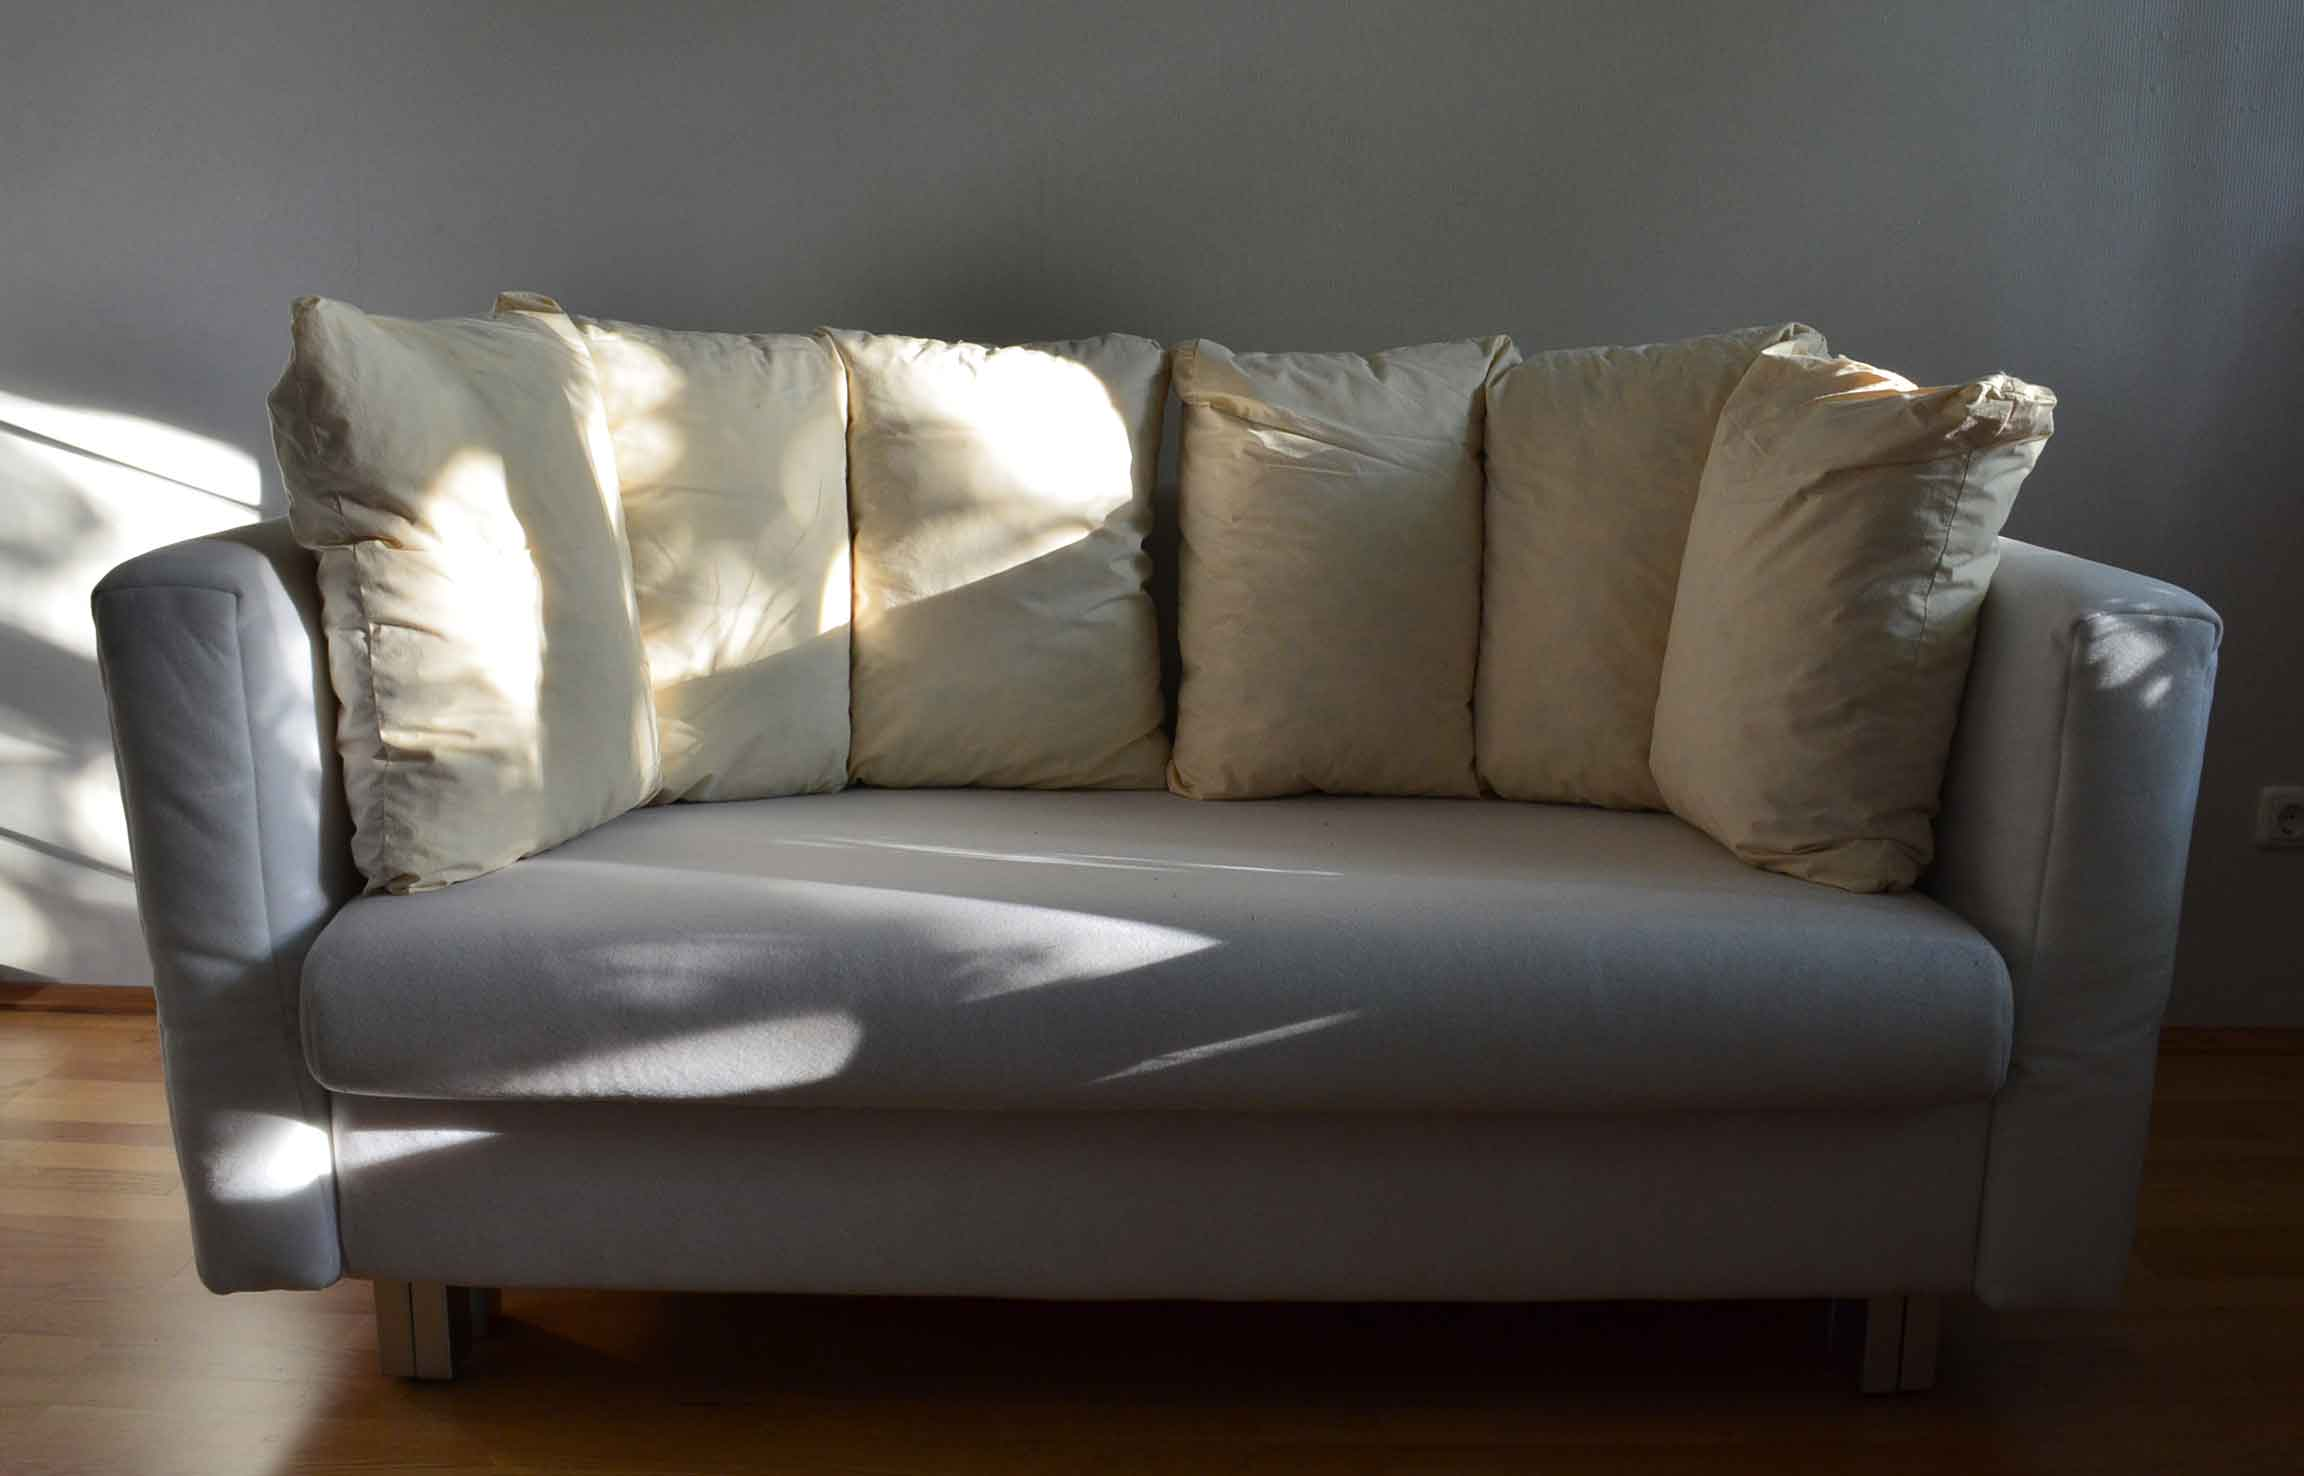 Ein Anfang ist gemacht: Sofa neu beziehen – roetsch.net